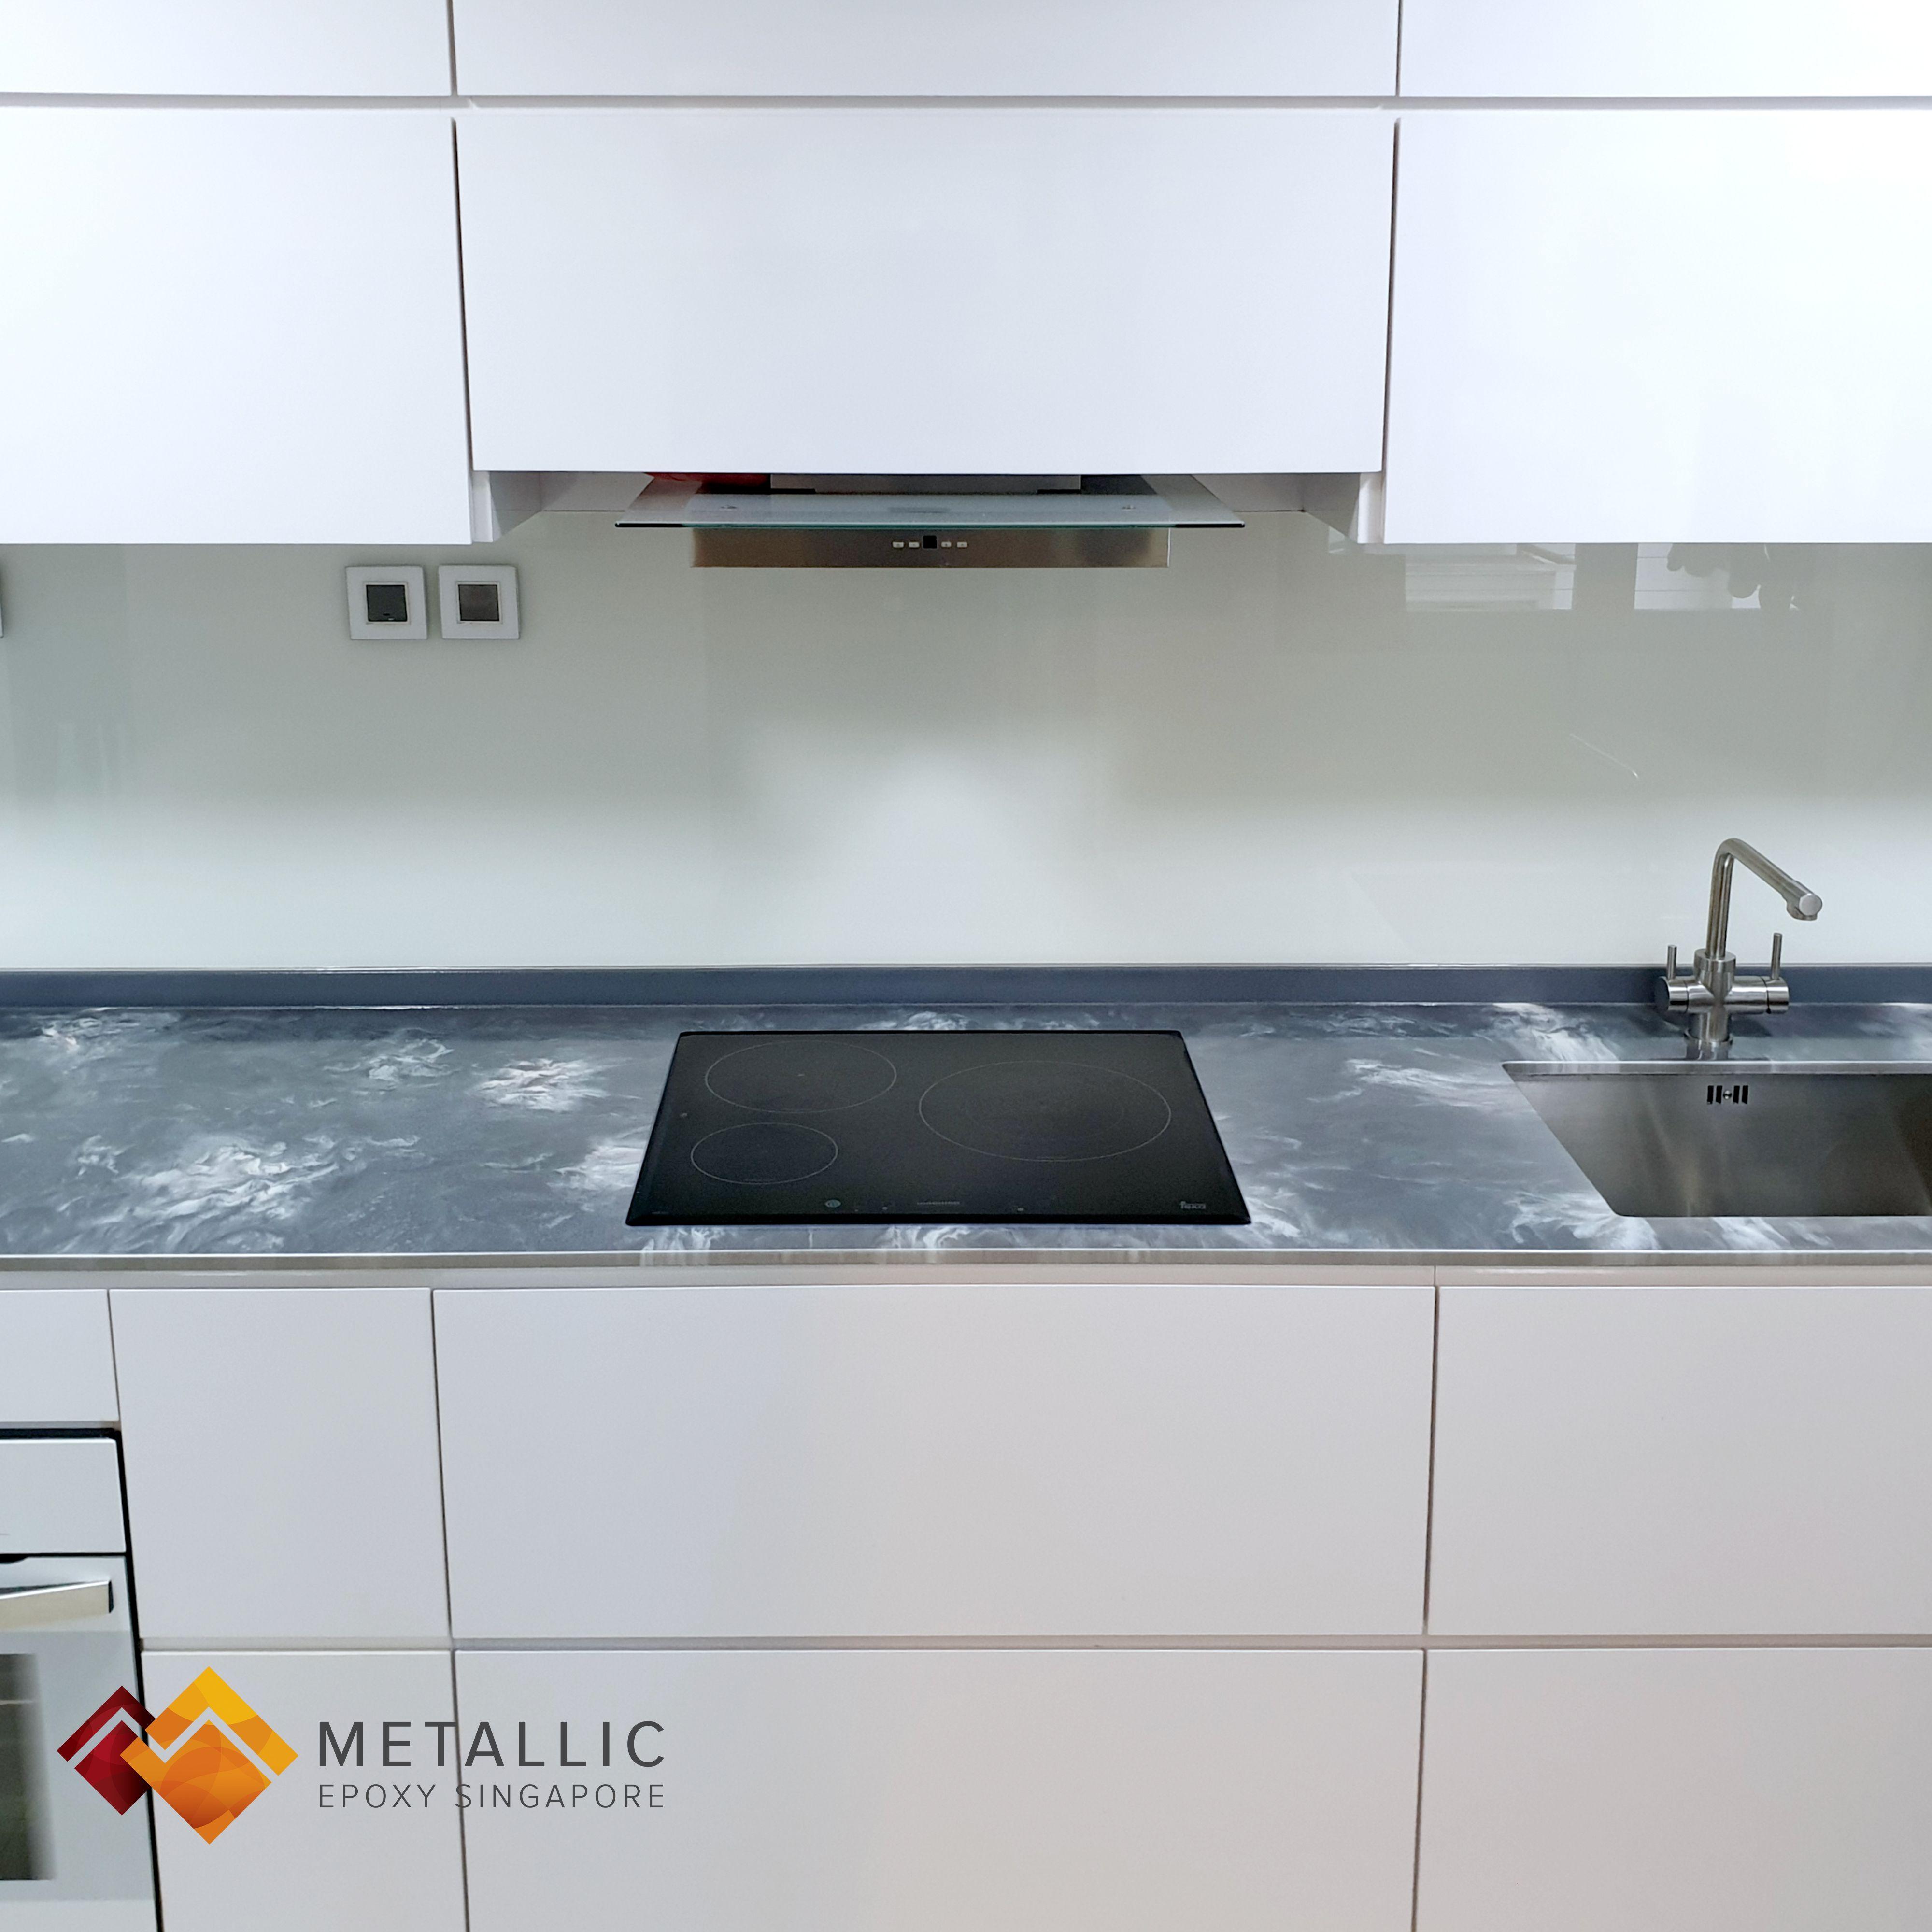 Metallic Epoxy Singapore White Highlights On Silver Base Kitchen Countertop In 2020 Countertops Countertop Design Kitchen Countertops